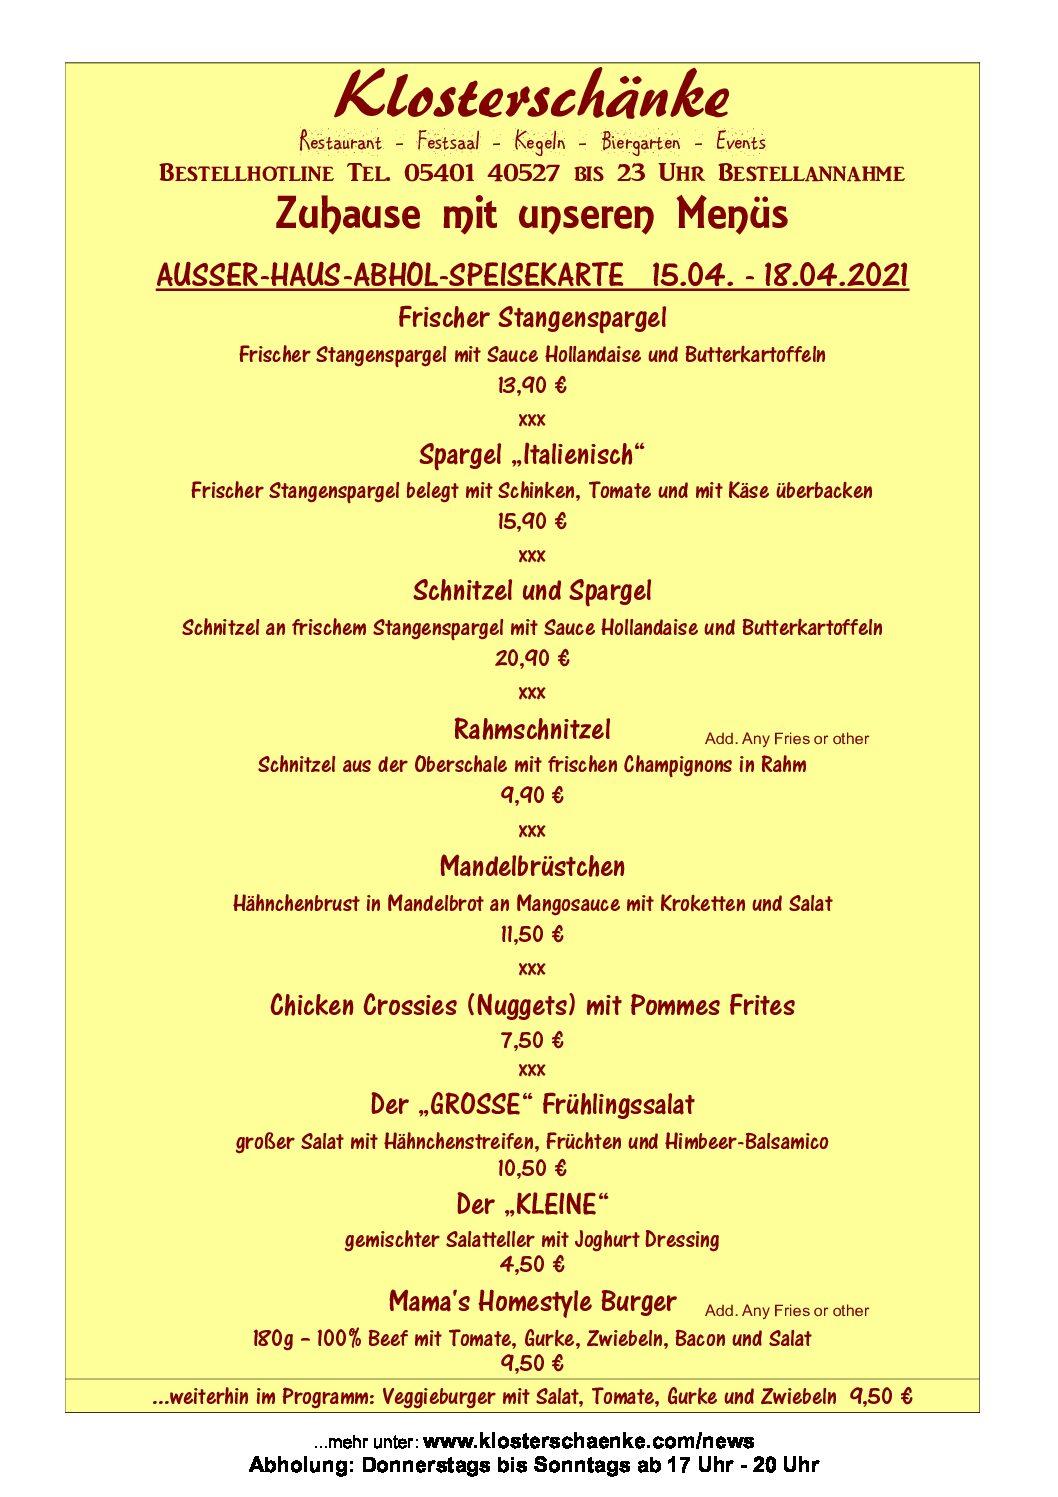 AUSSER-HAUS-SPEISEKARTE 15.04 – 18.04.2021